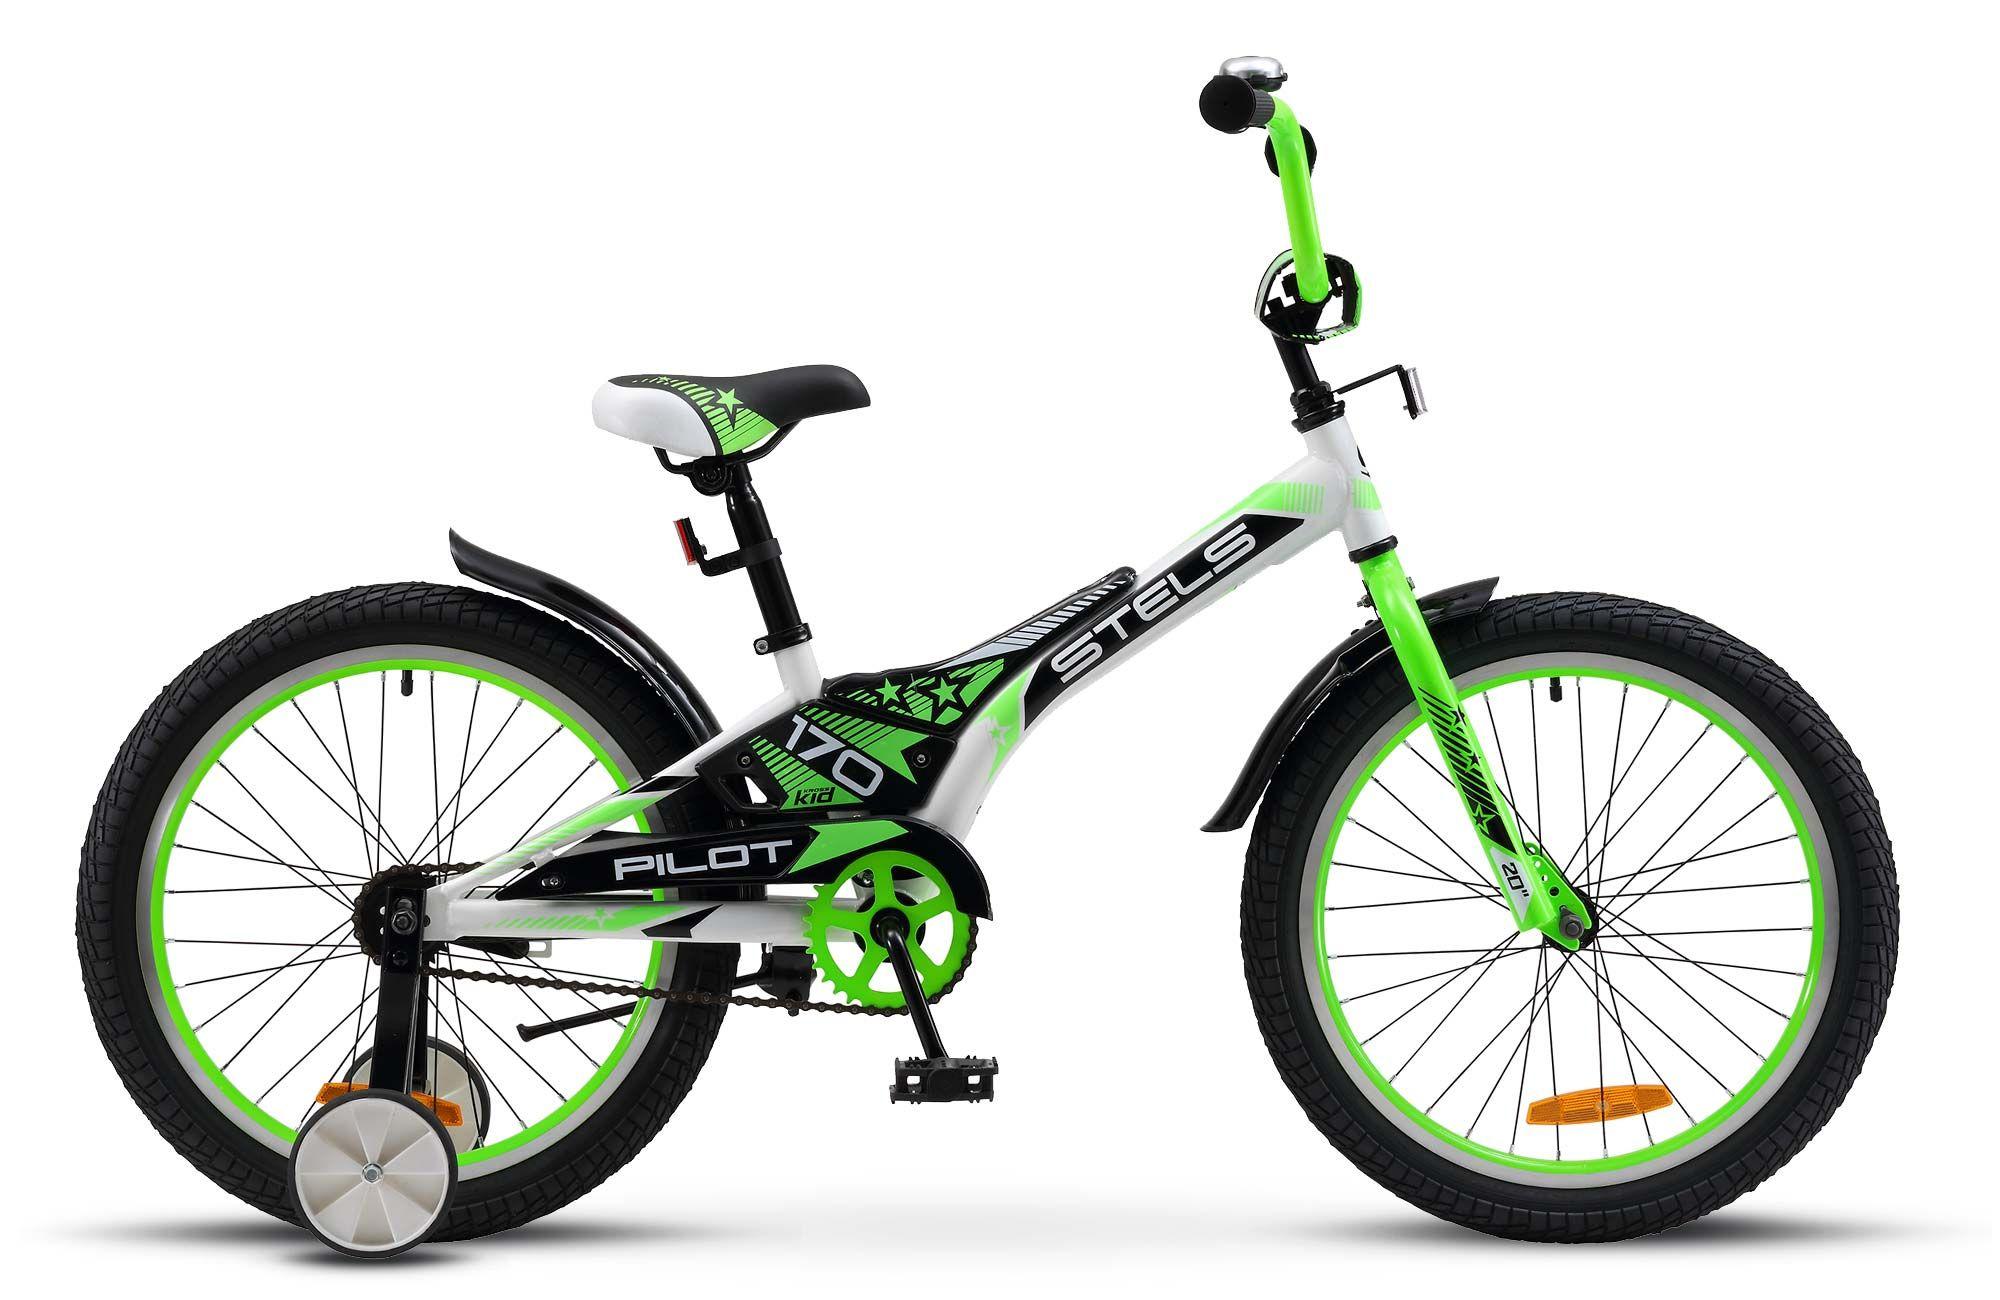 Велосипед Stels Pilot 170 20 (V020) 2018